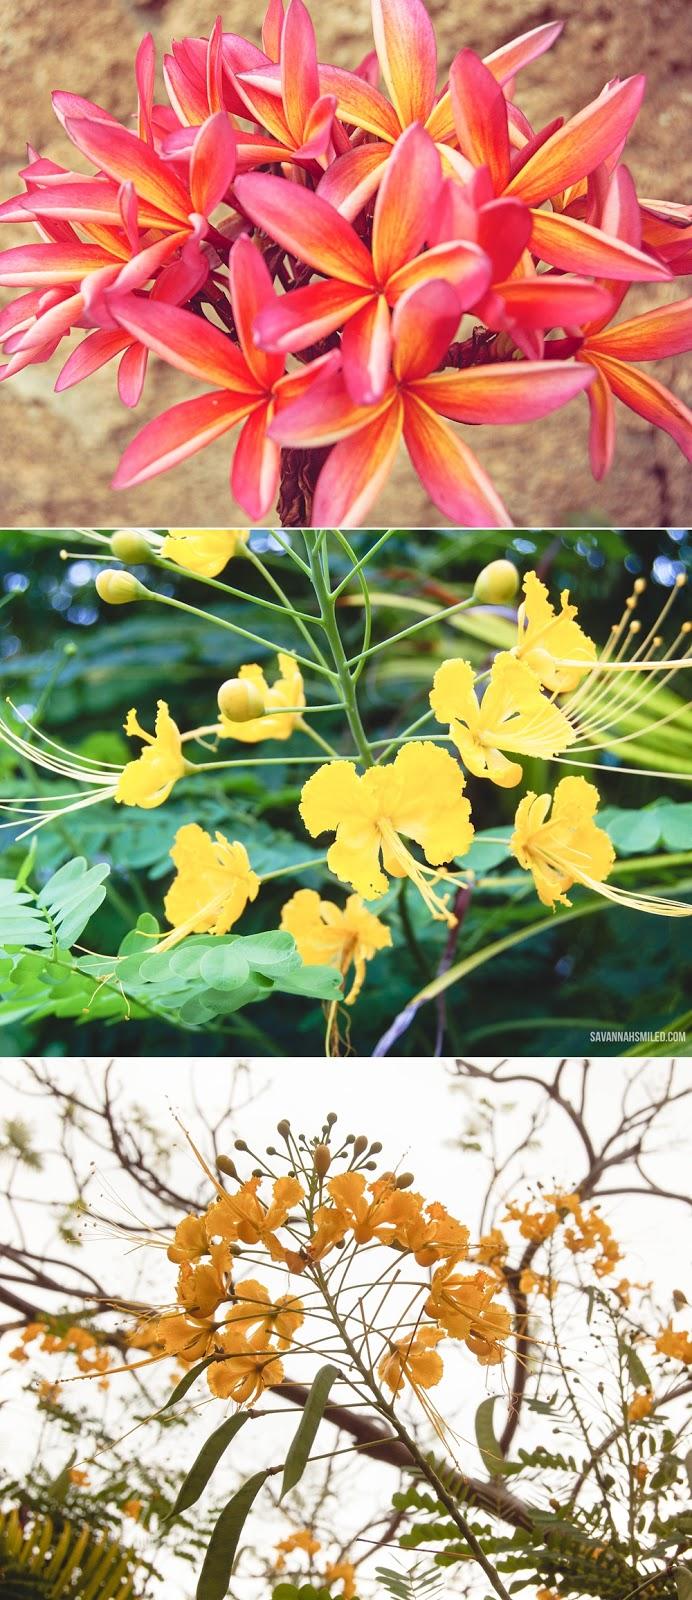 florals-in-kailua-hawaii-7.jpg